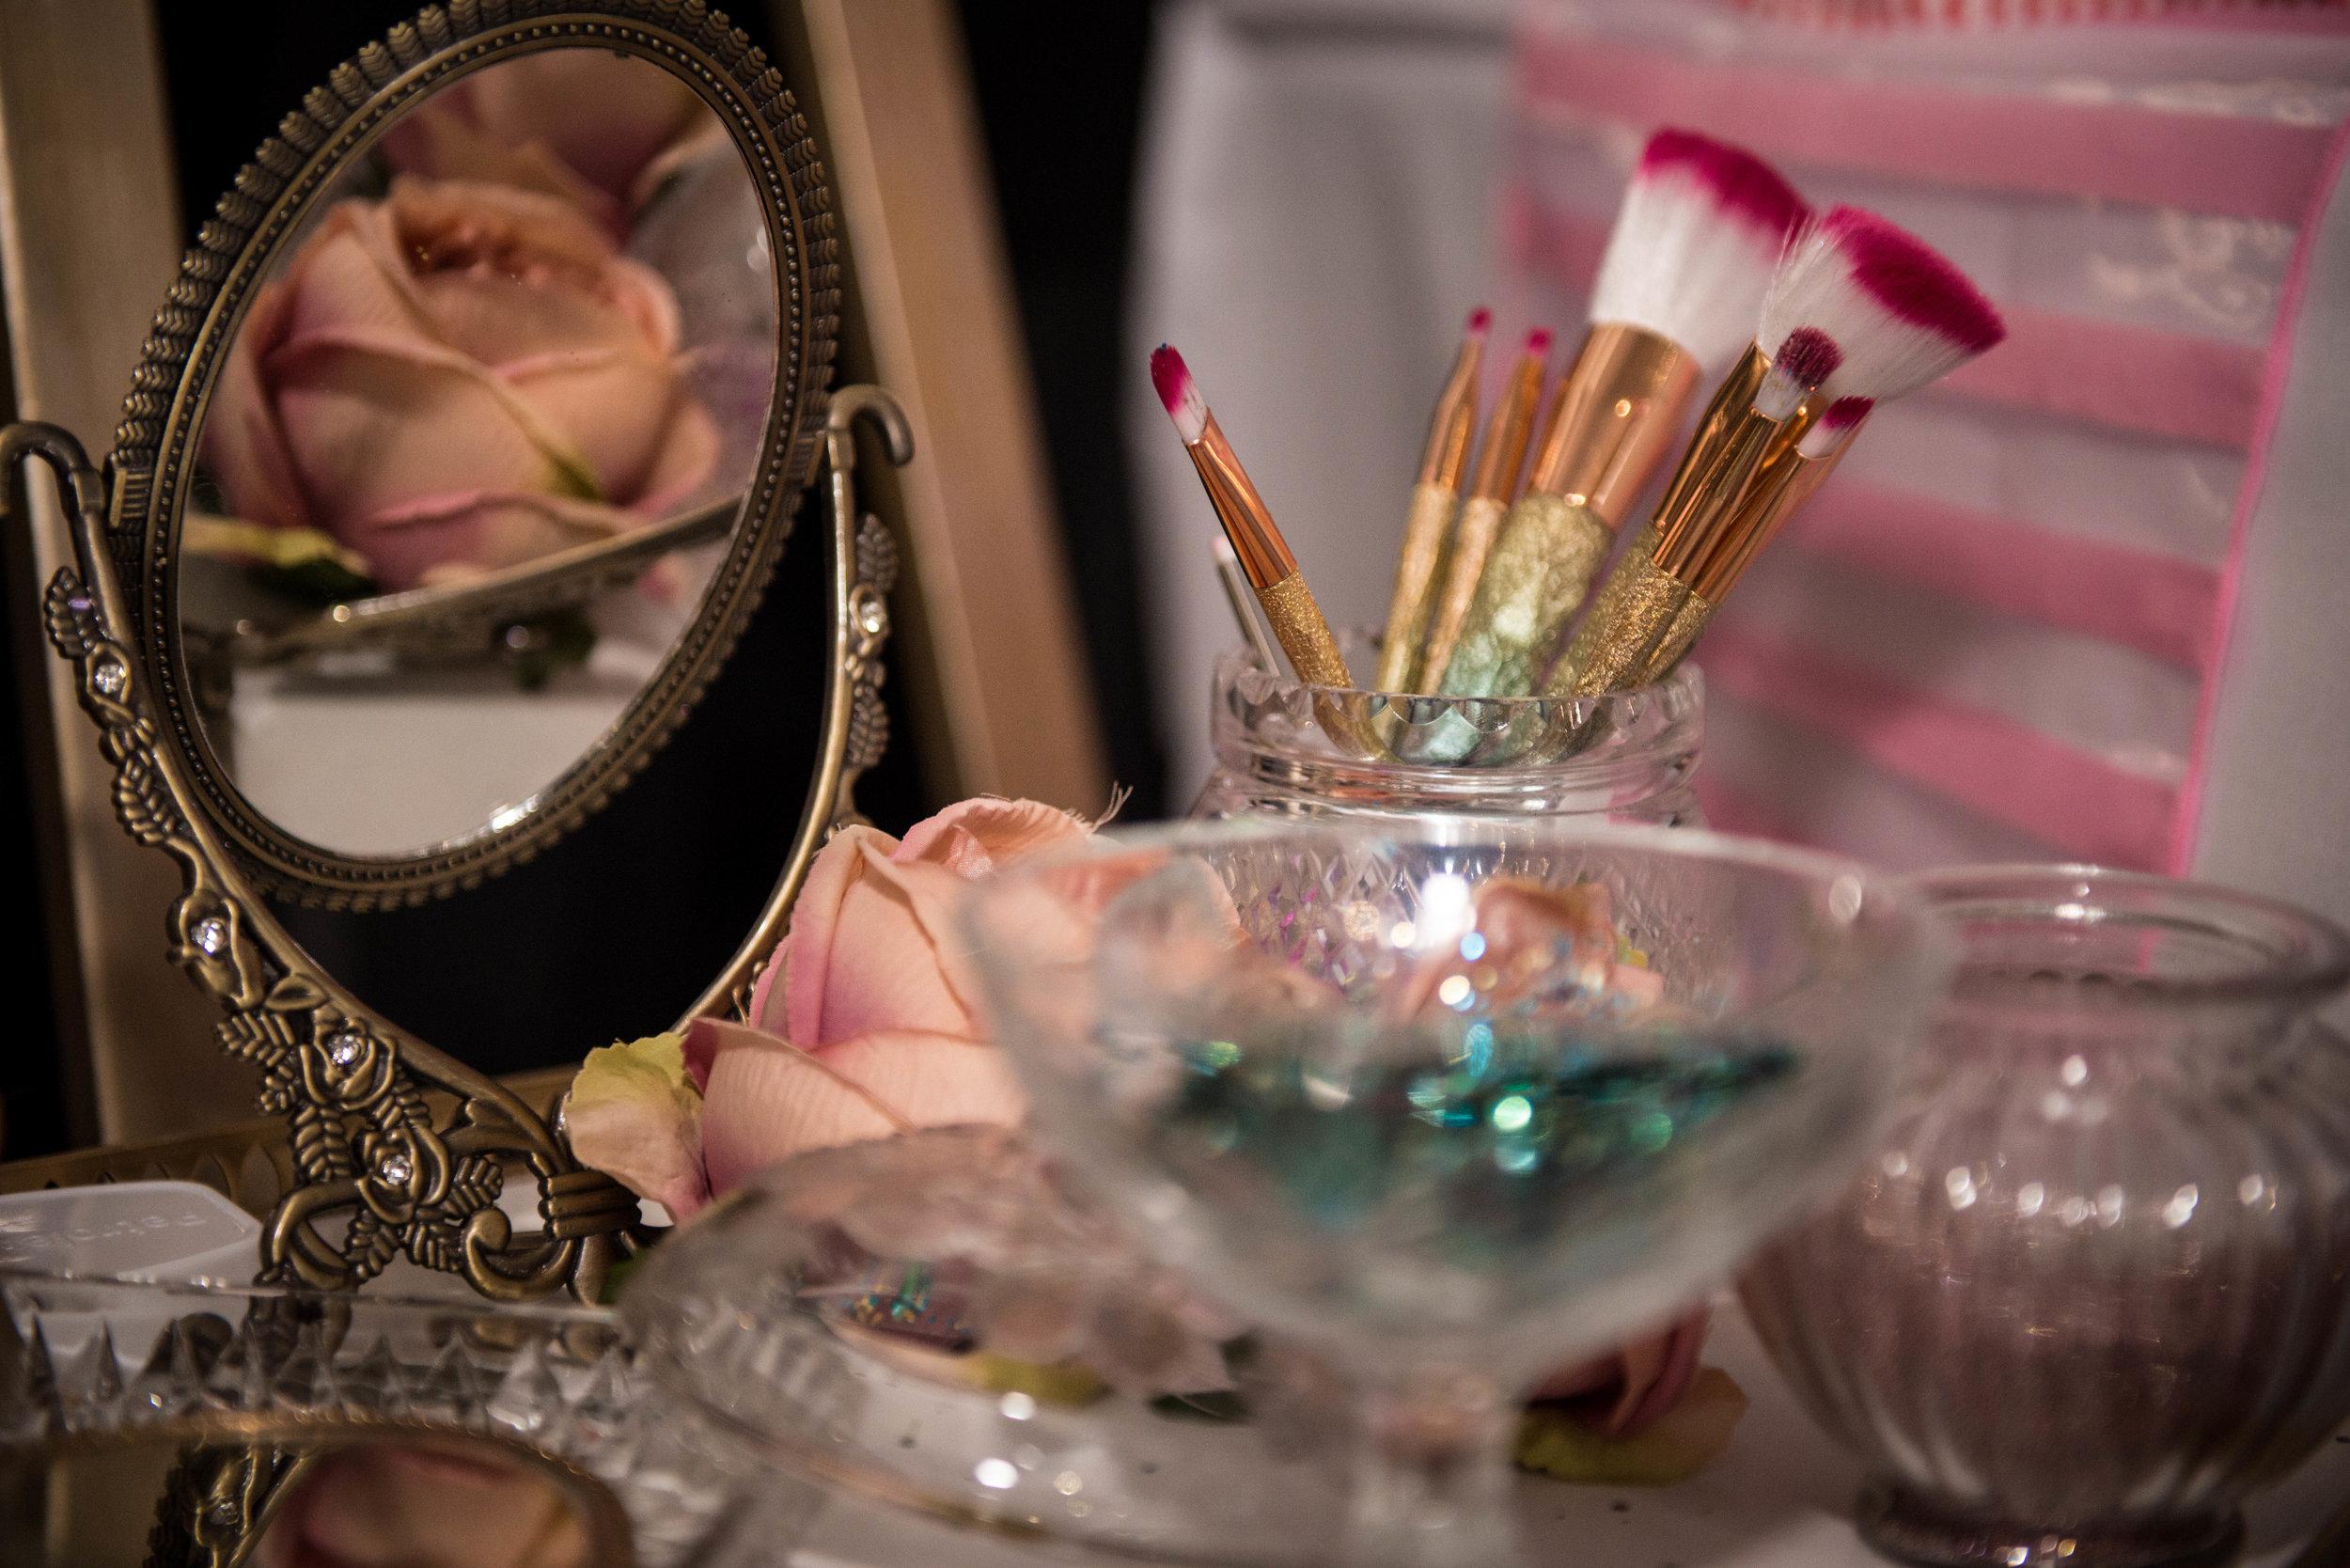 The Hottest Trends in Wedding Entertainment, Glitter Bar www.redeventweddingfayres.com/blog